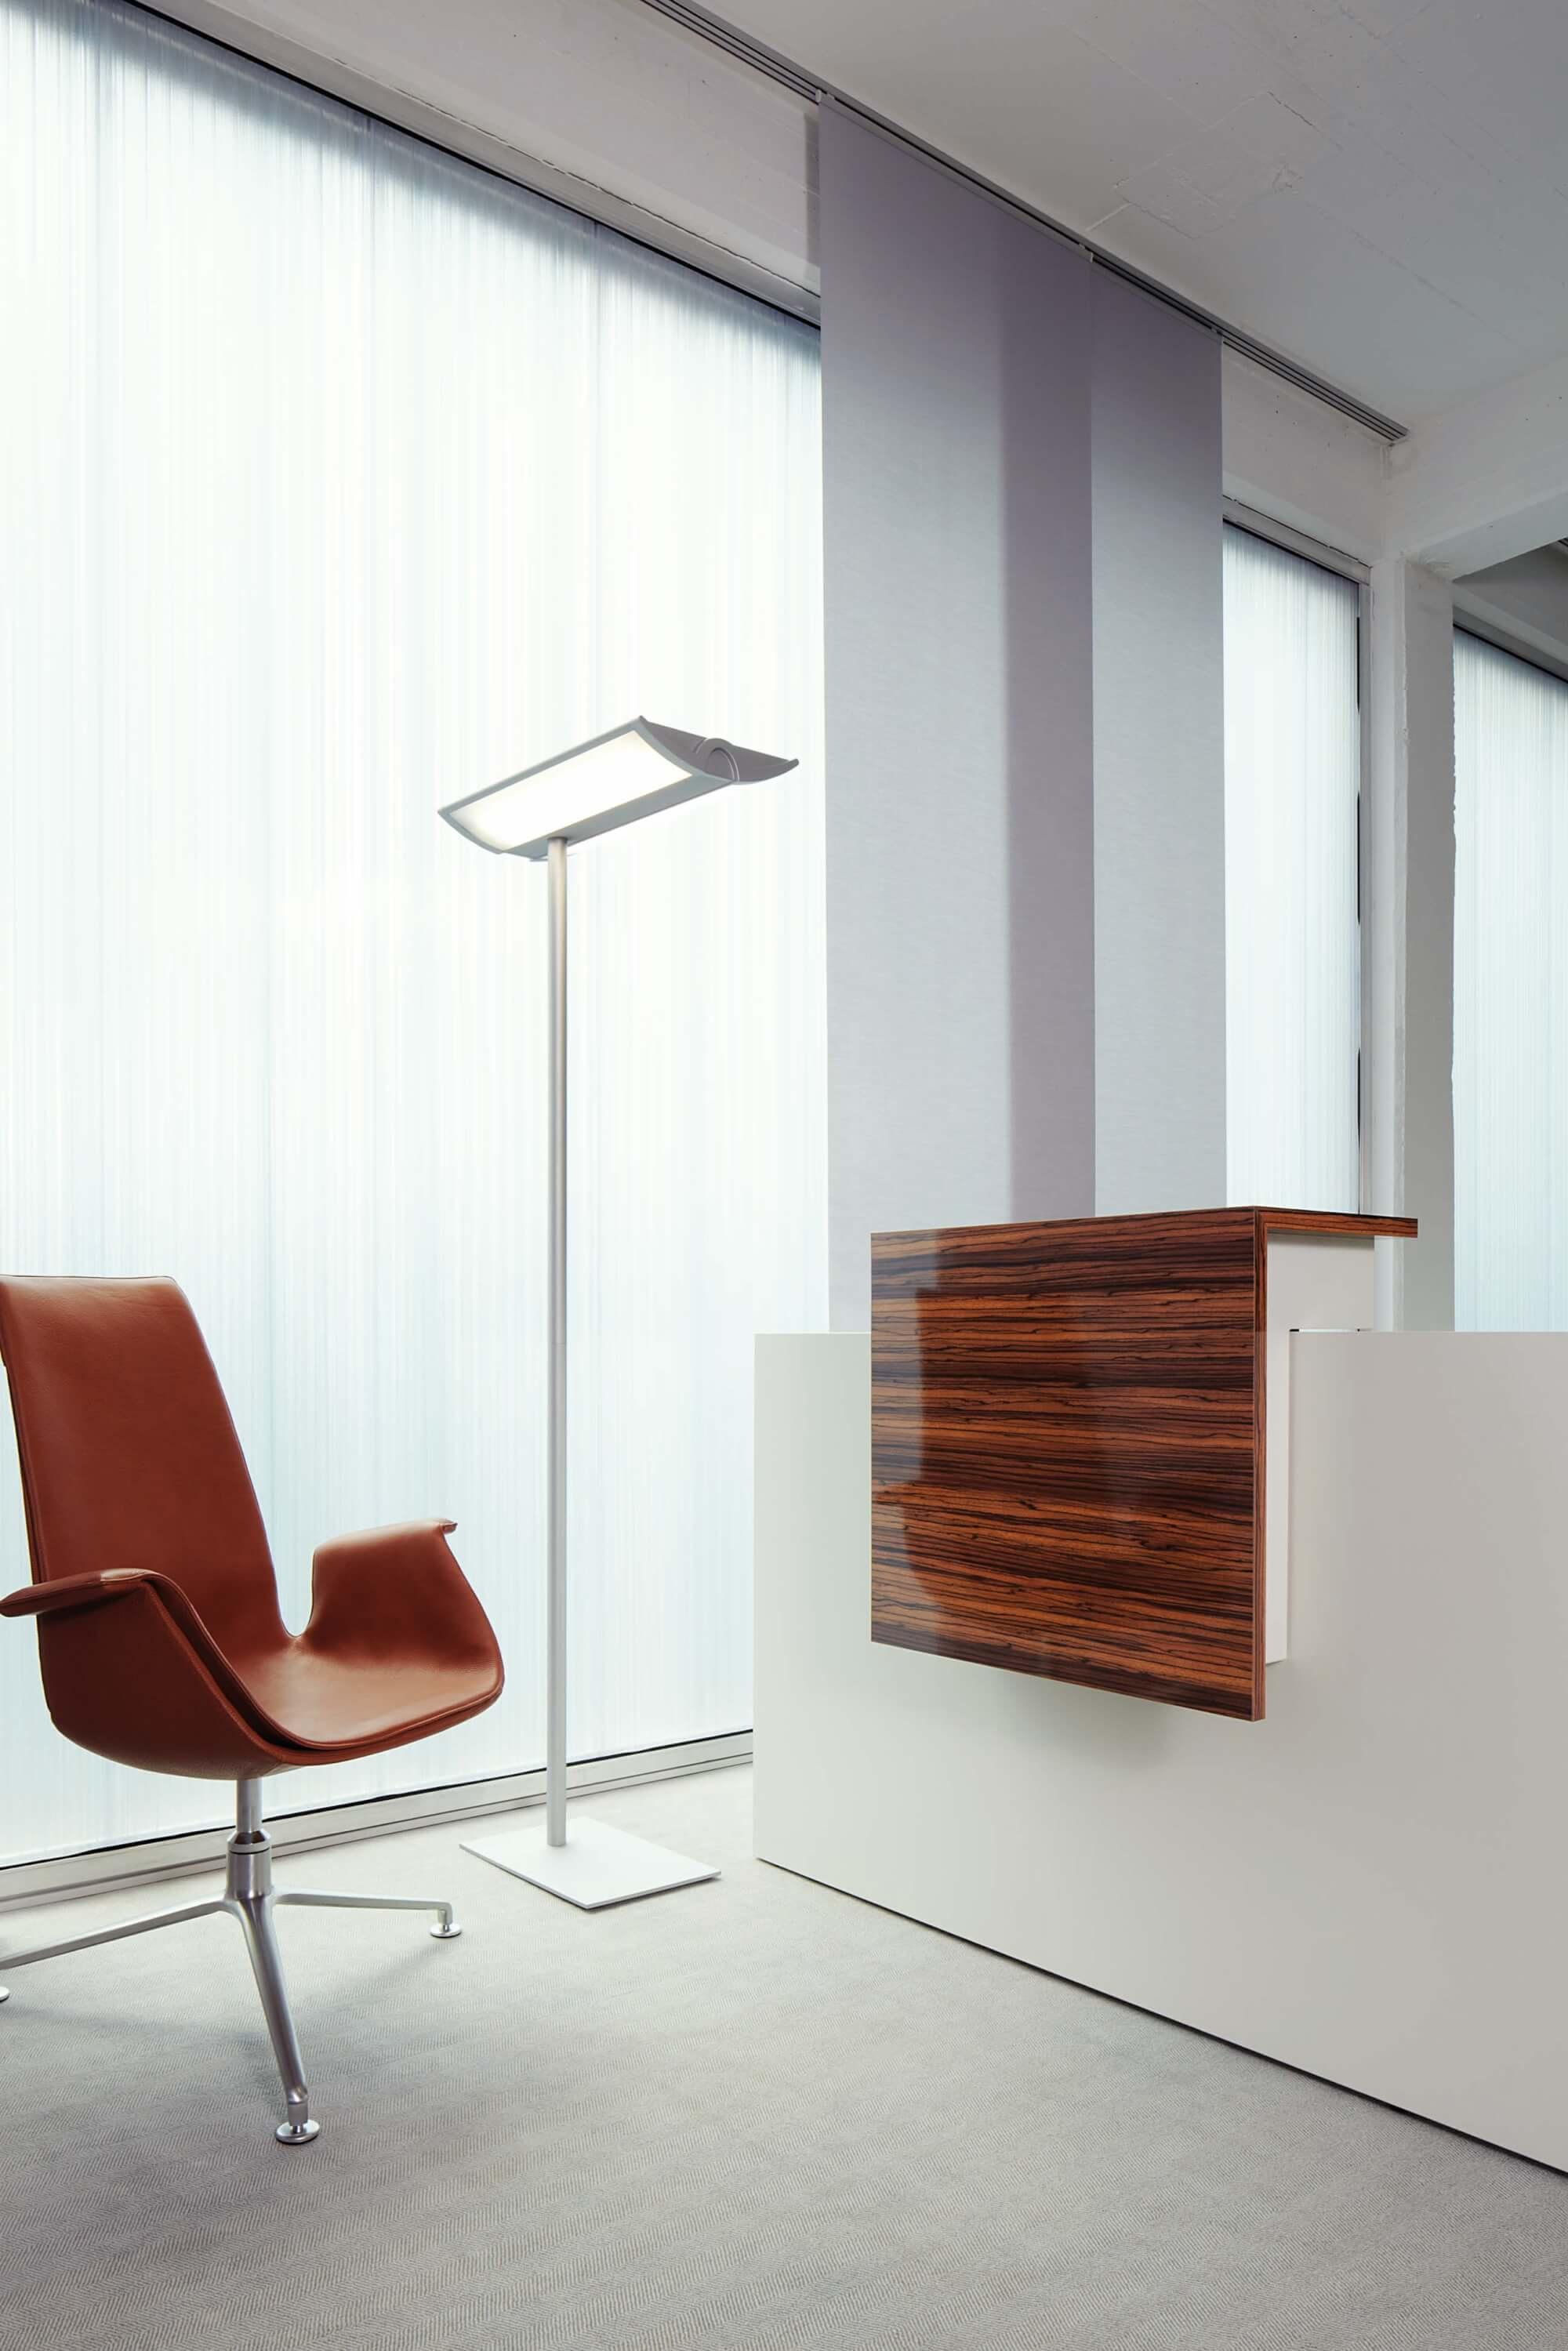 Energiespar-Stehlampe MAULavior